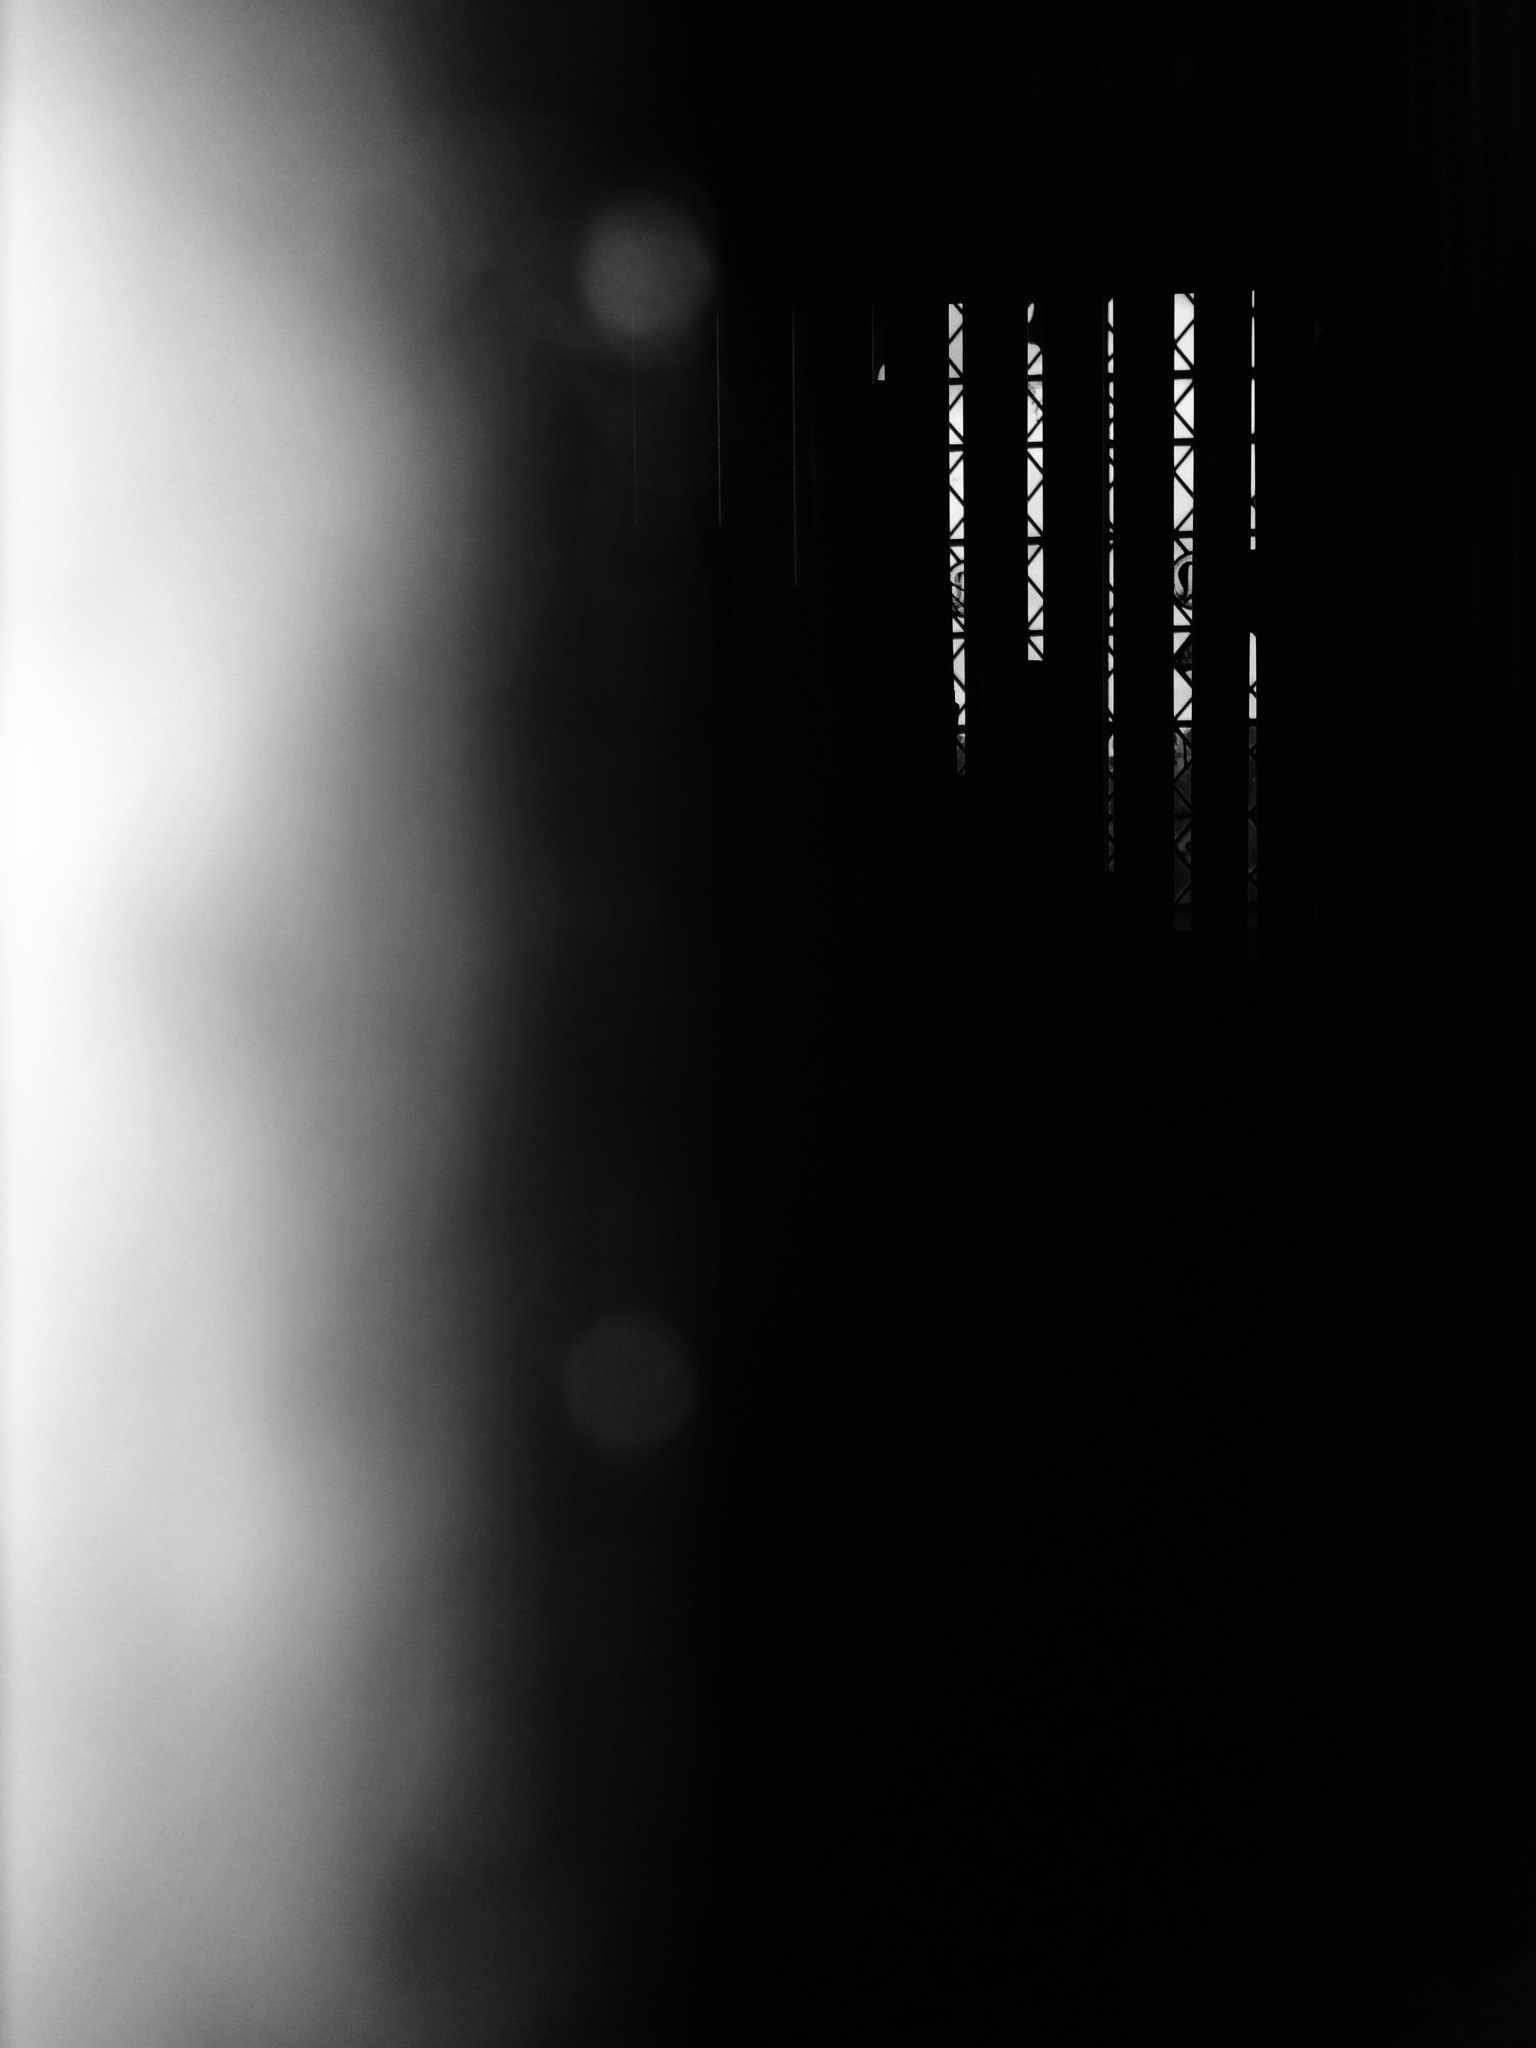 Organ Pipes by Ian Haygreen